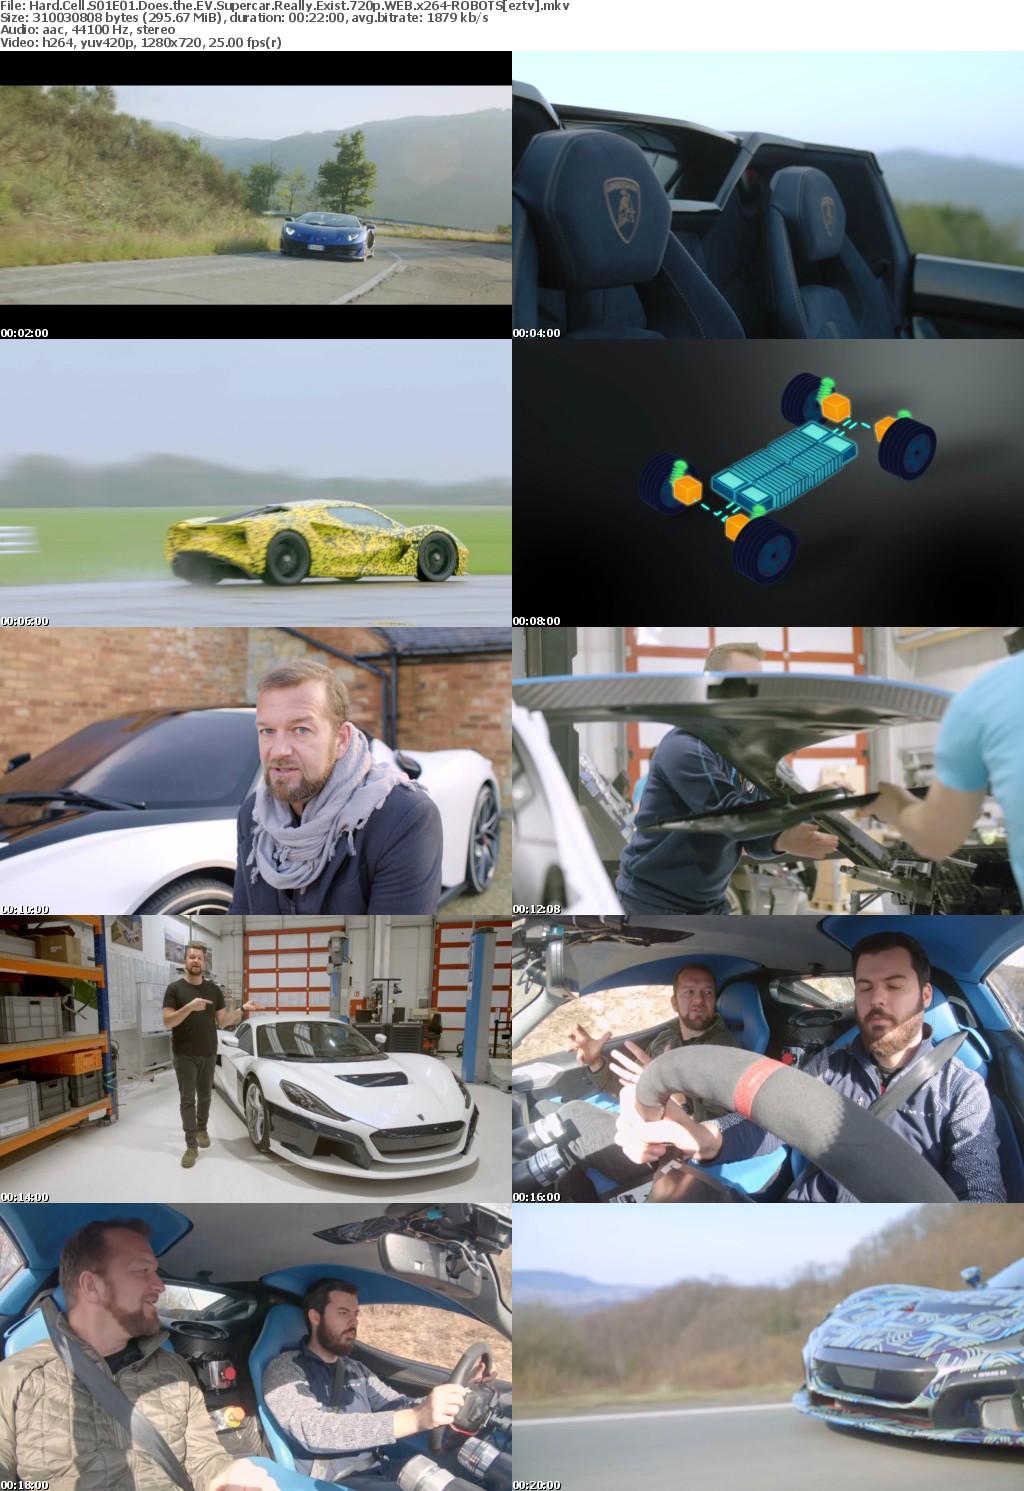 Hard Cell S01E01 Does the EV Supercar Really Exist 720p WEB x264-ROBOTS